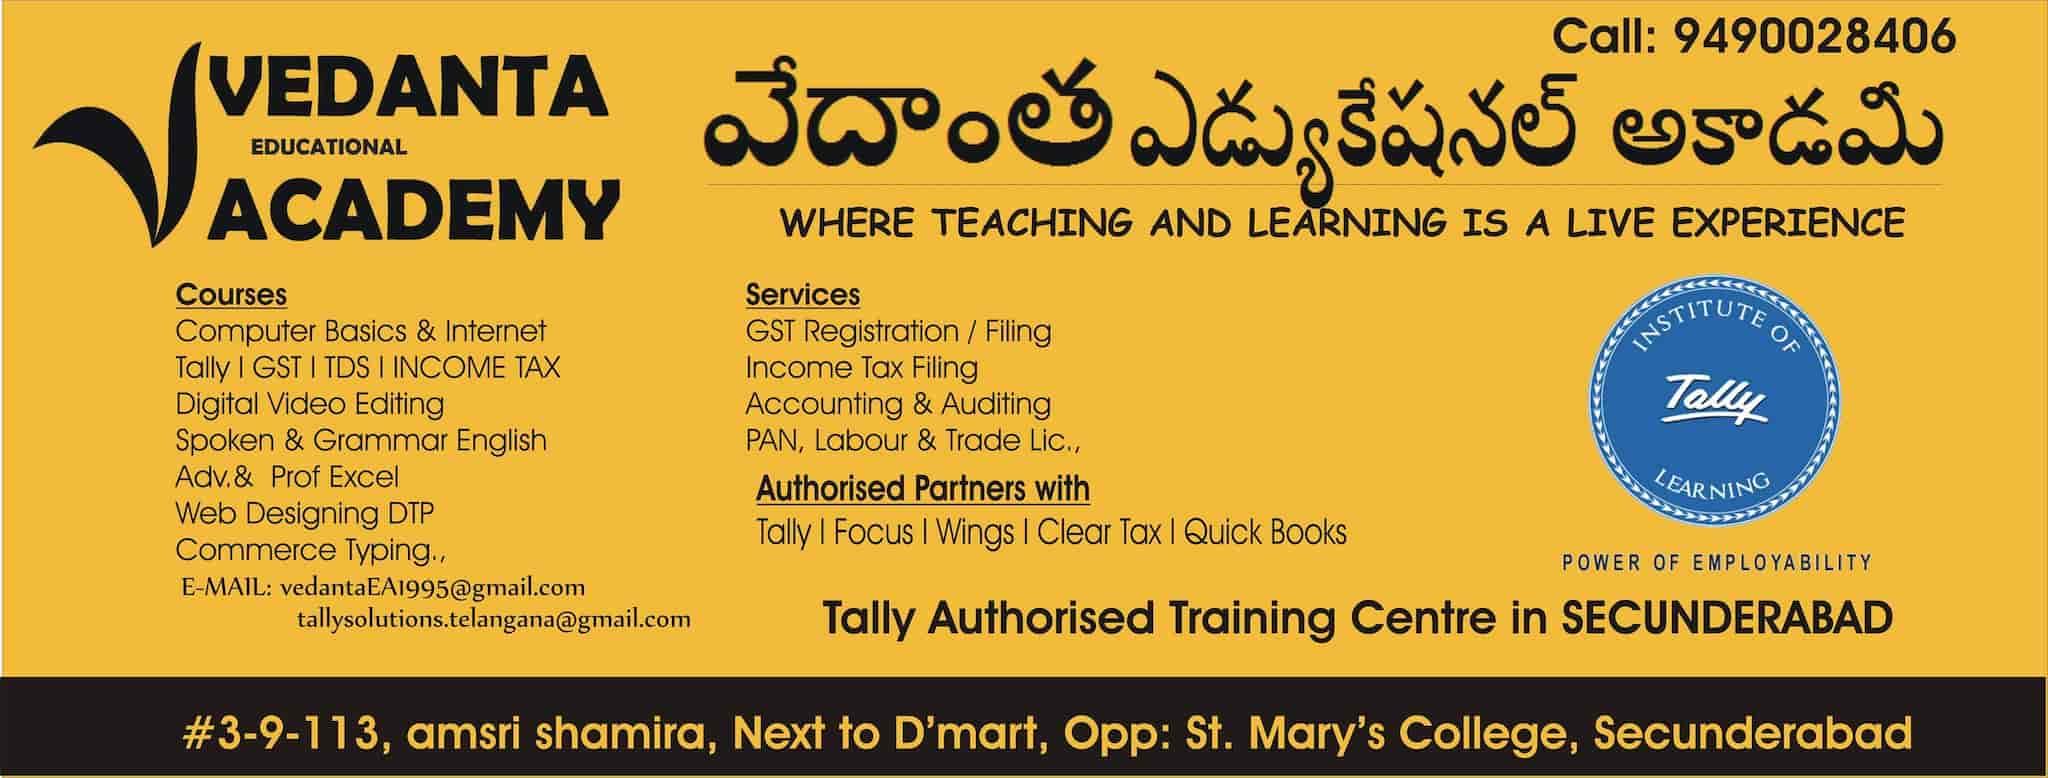 Vedanta Educational Academy, Secunderabad - Computer